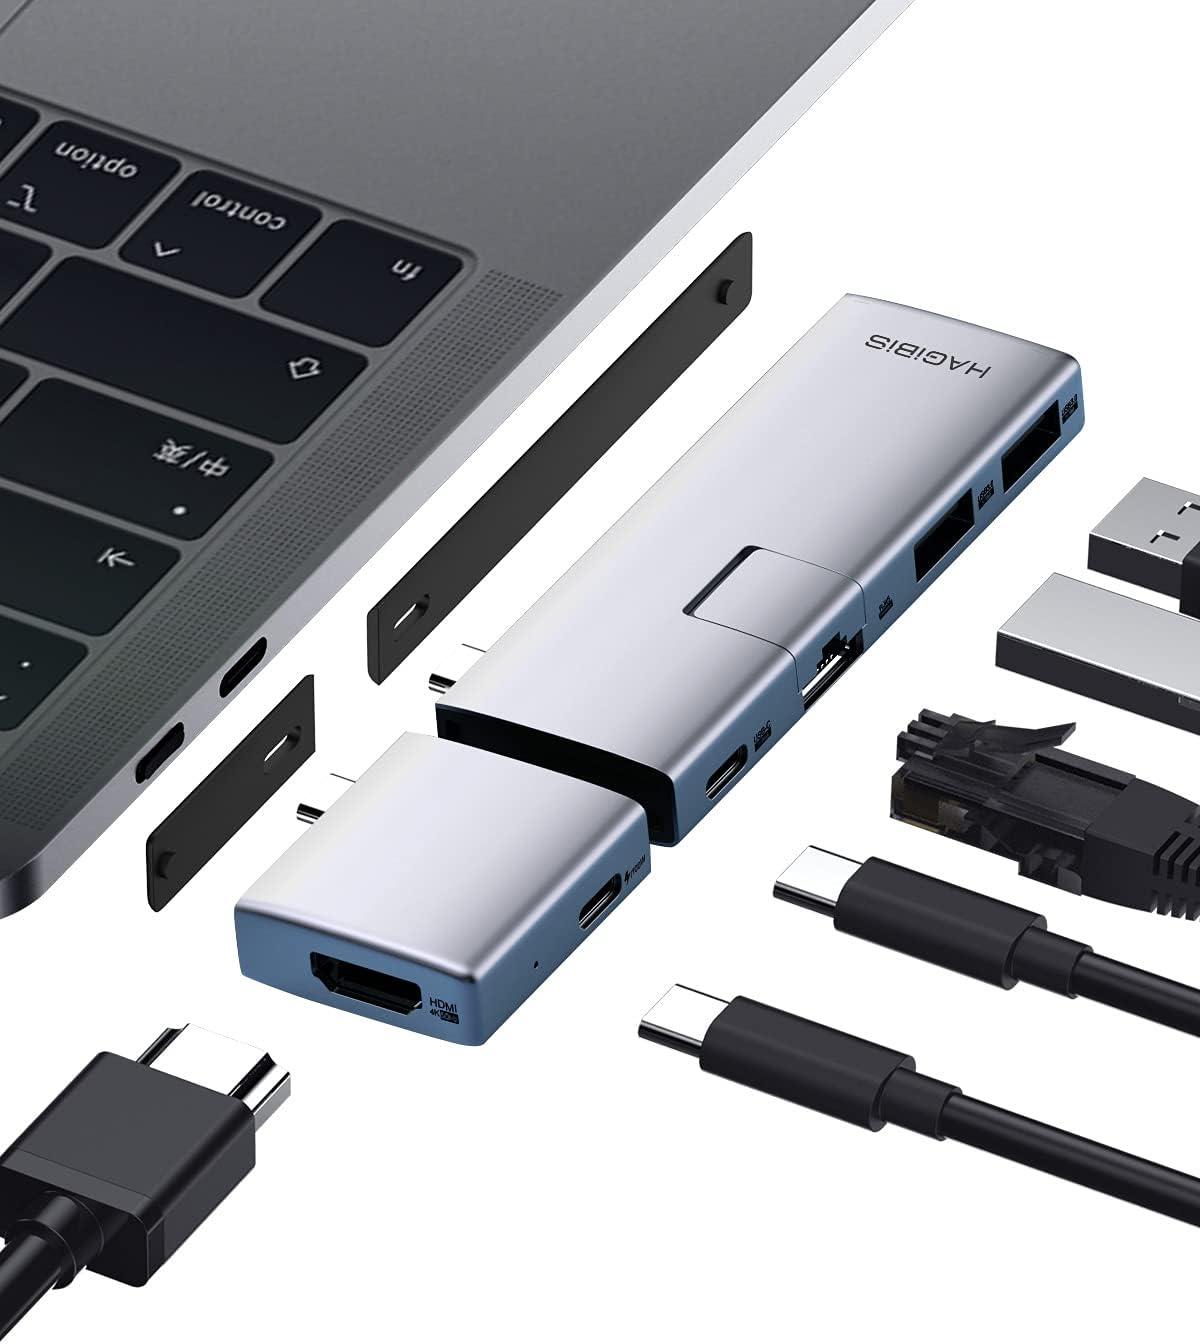 Hagibis USB C Hub Modular Magnetic USB Type-C Hub with 4K@60Hz HDMI, Separated Dual USB-C Adapter for MacBook Pro Air M1/2020/2019/2018 iPad Pro, Gigabit Ethernet, USB 3.0, 100W Power Delivery (RJ45)